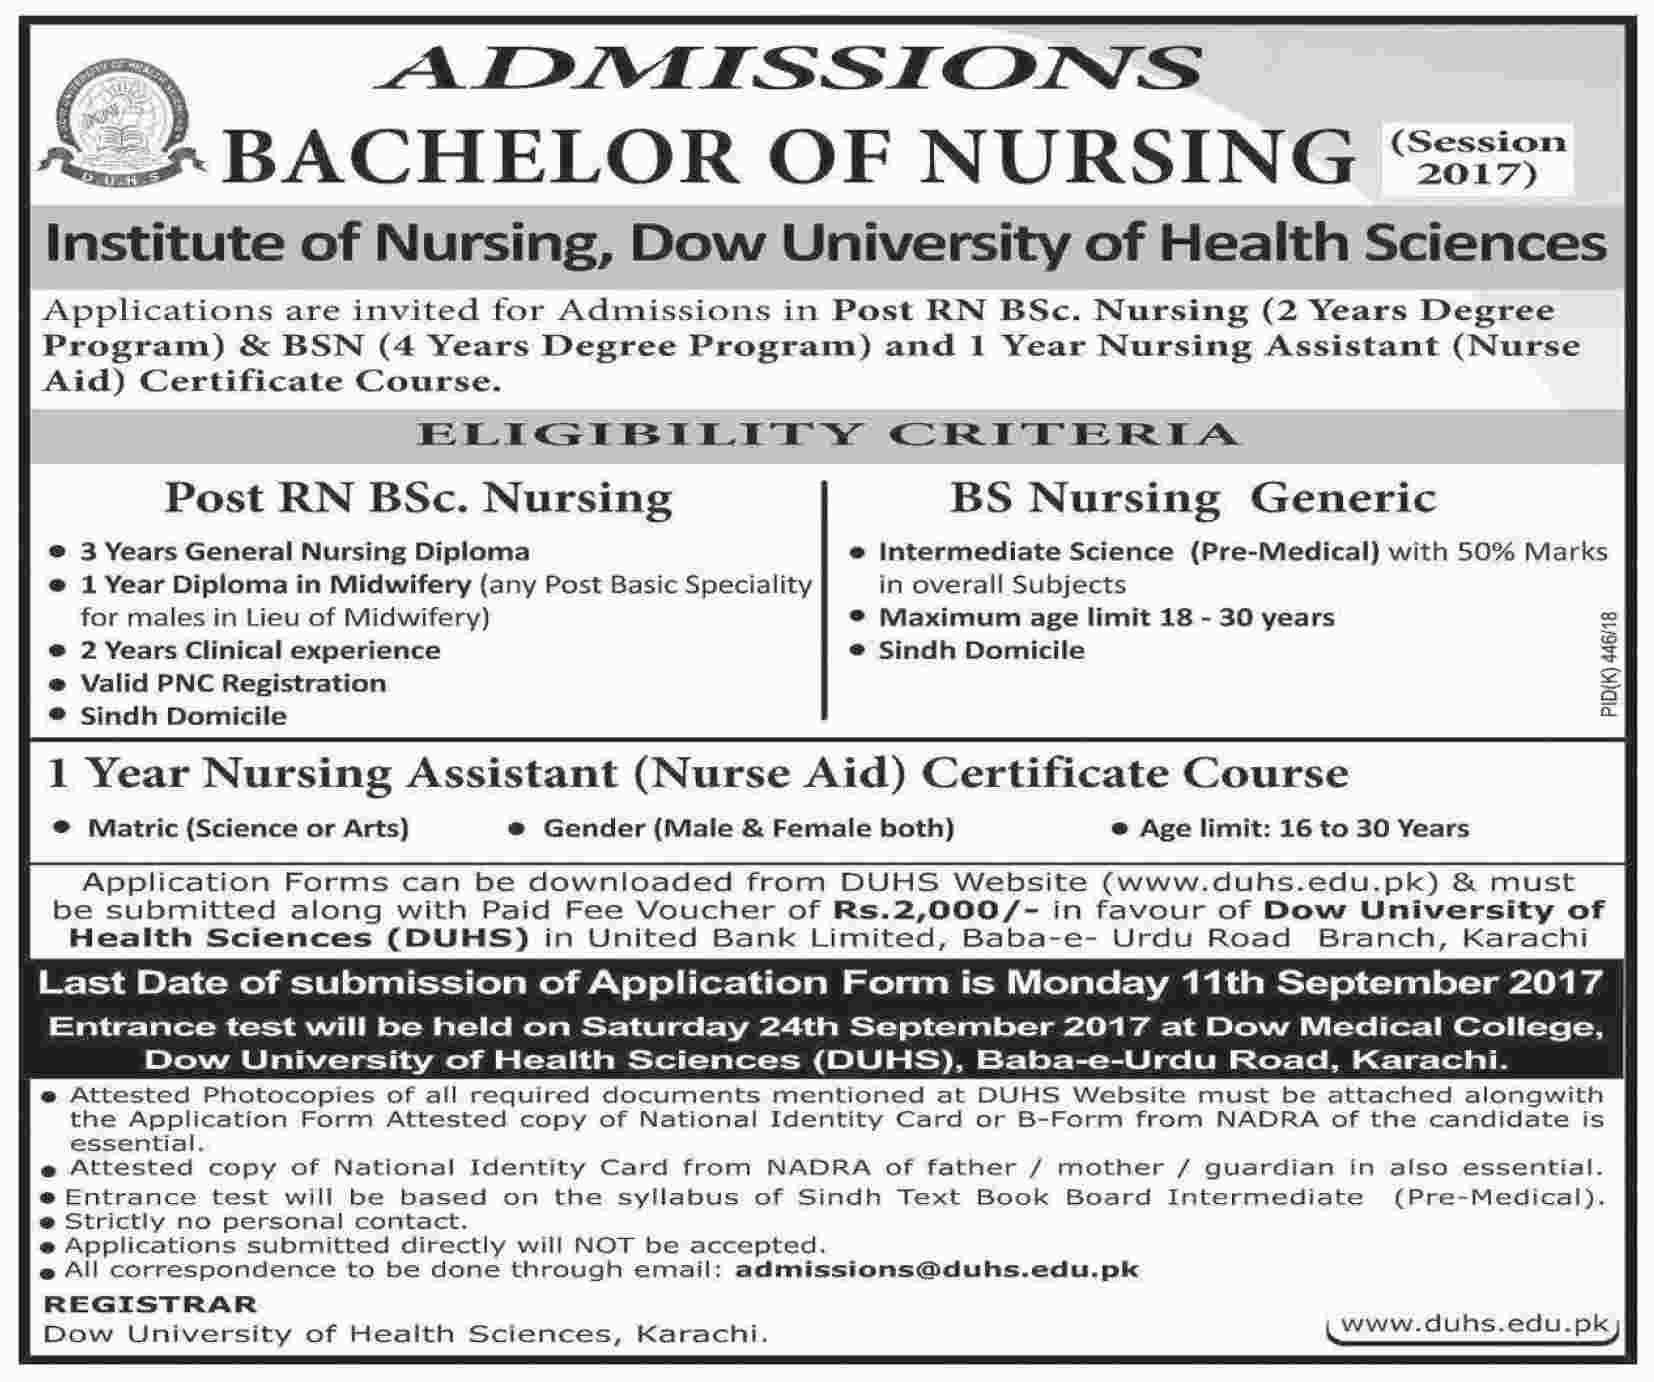 Dow University Of Health Sciences Karachi Admissions 2017